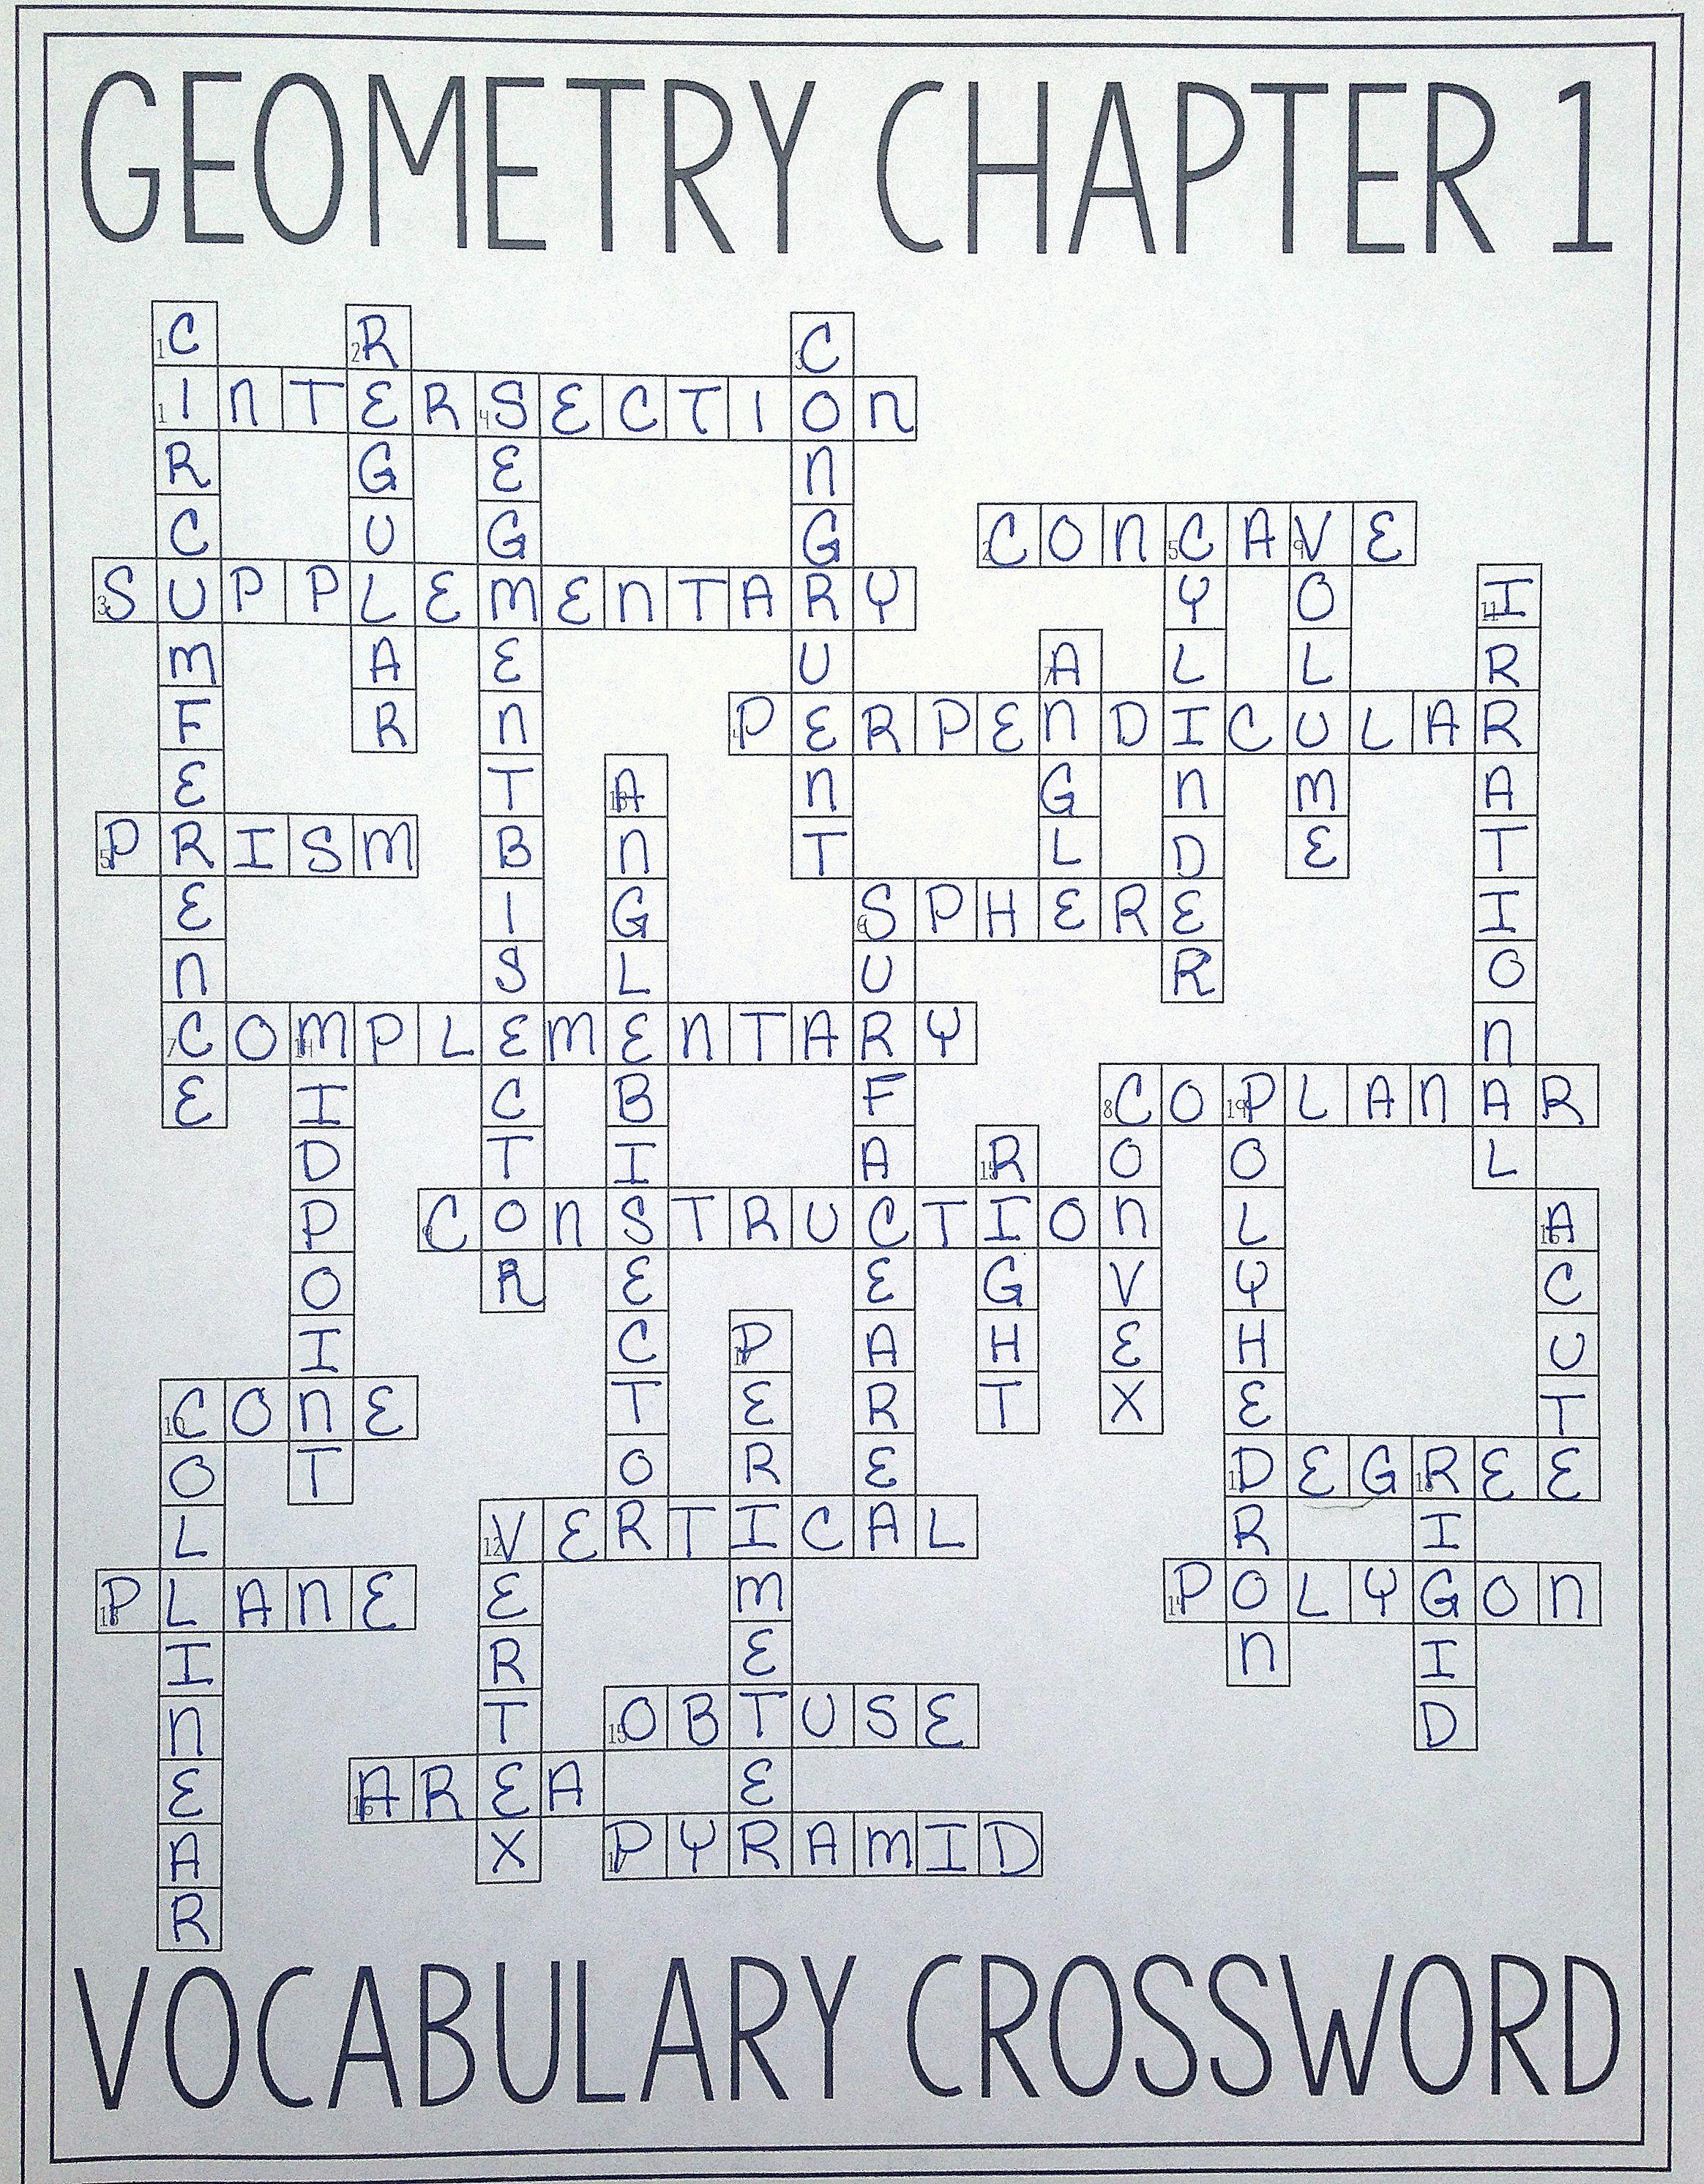 8th Grade Math Vocabulary Crossword Geometry Chapter 1 Vocabulary Crossword tools Of Geometry